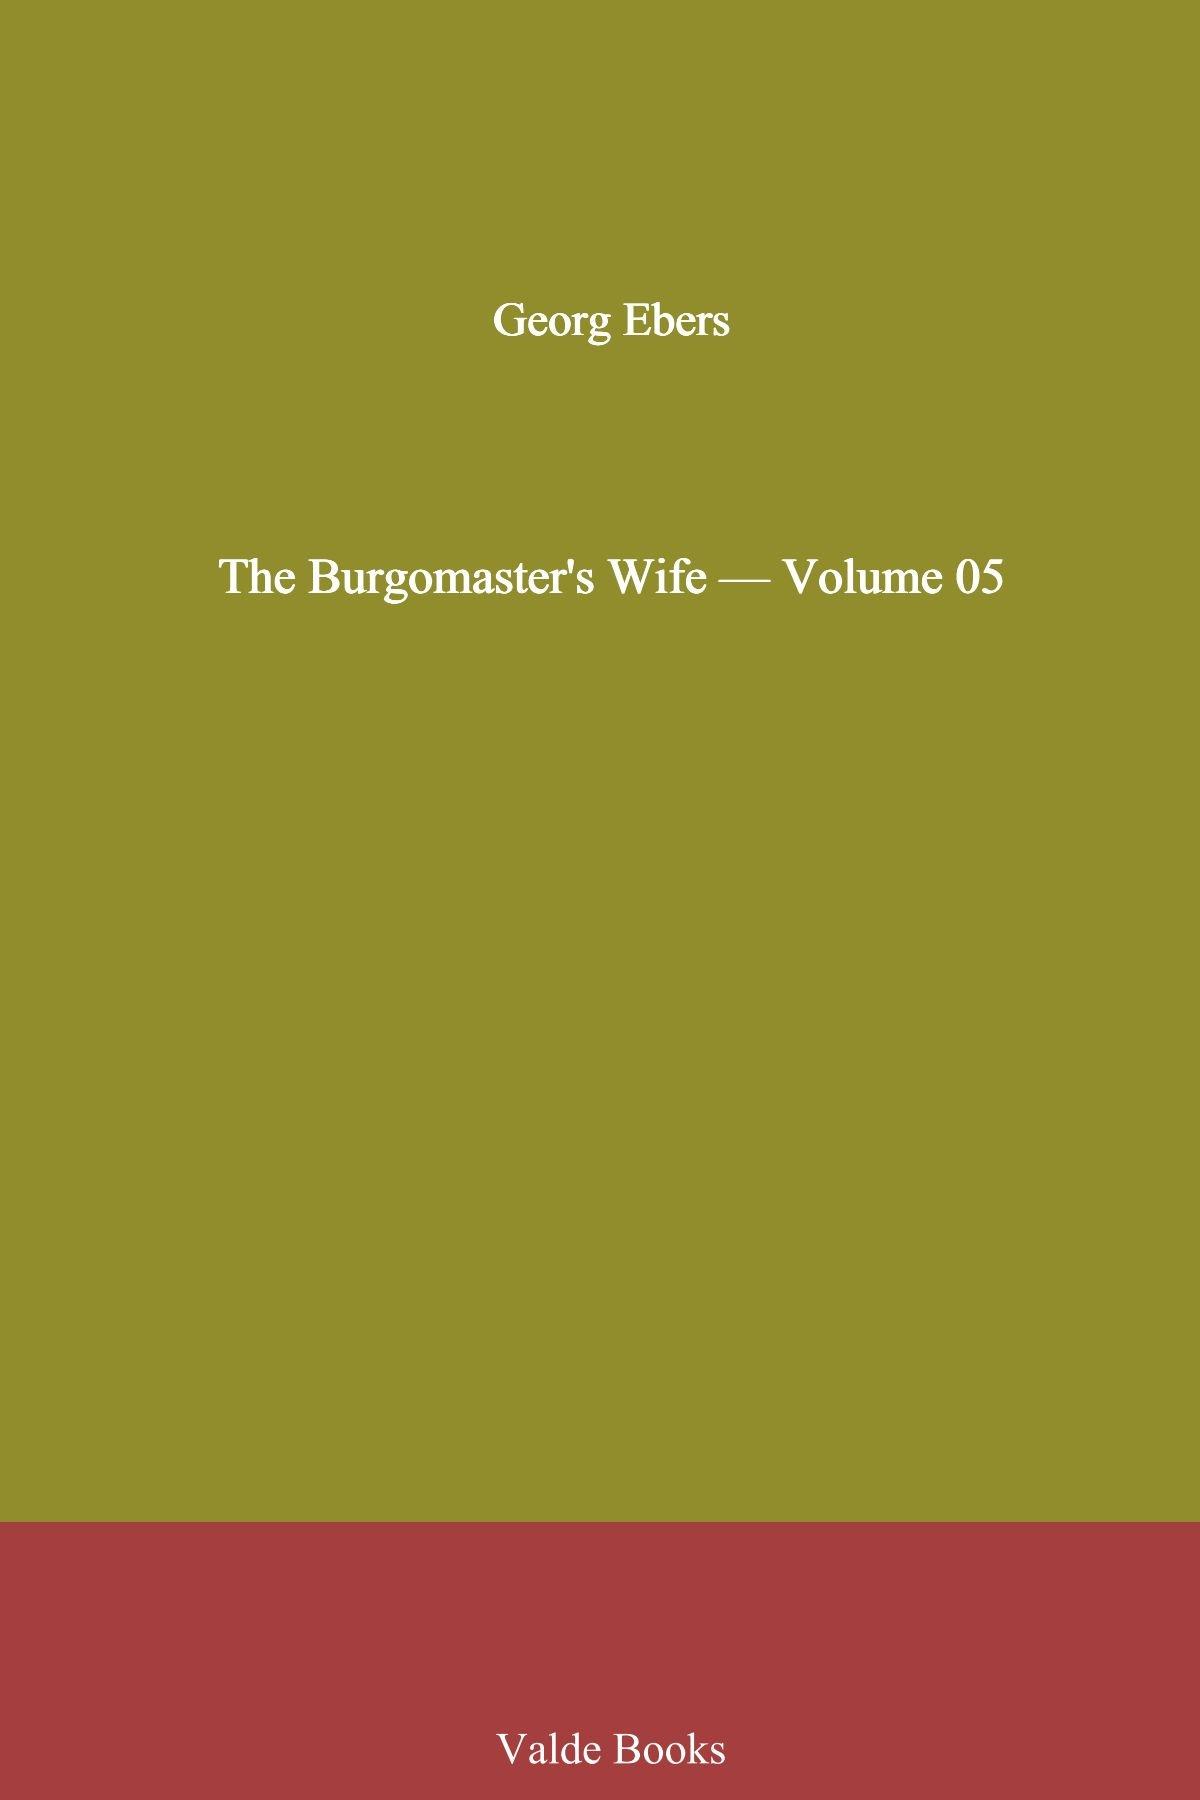 Read Online The Burgomaster's Wife - Volume 05 ebook